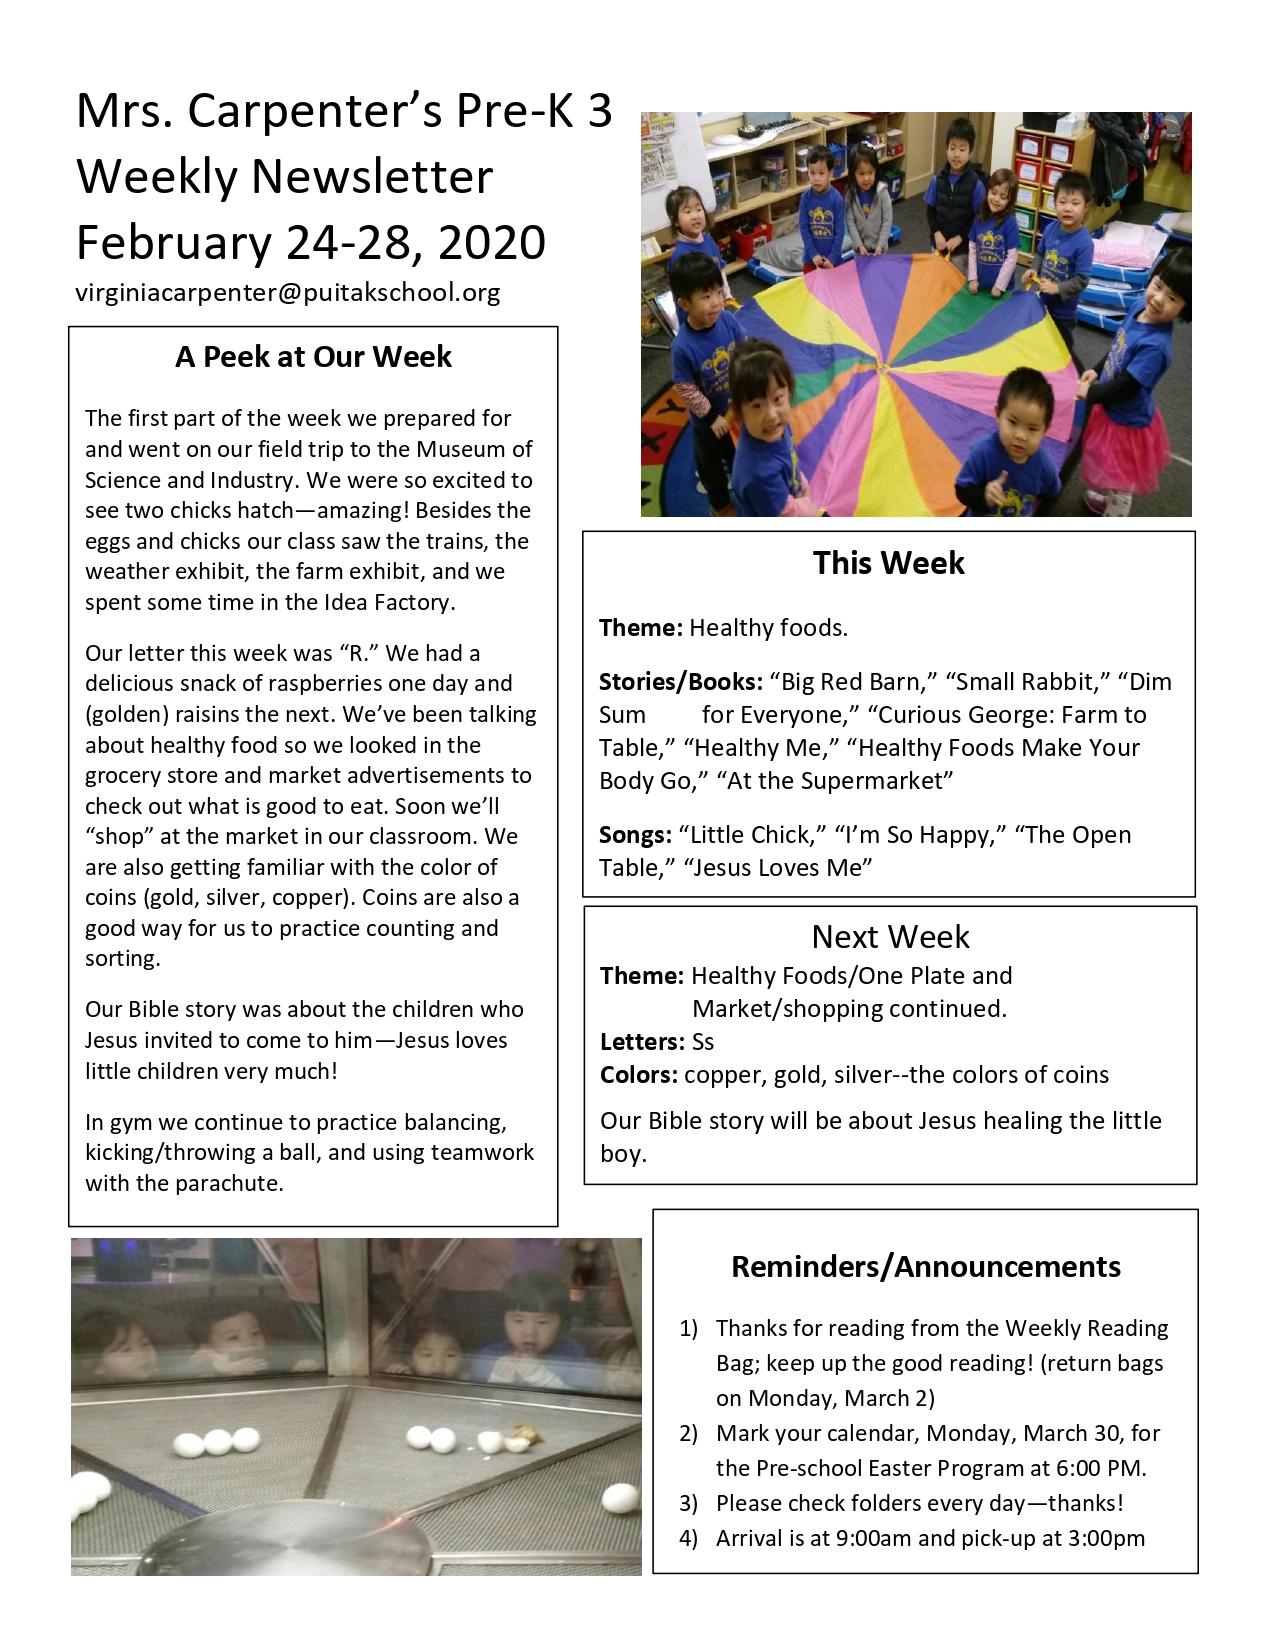 GinnyNewsletter2020February4thWeek_page-